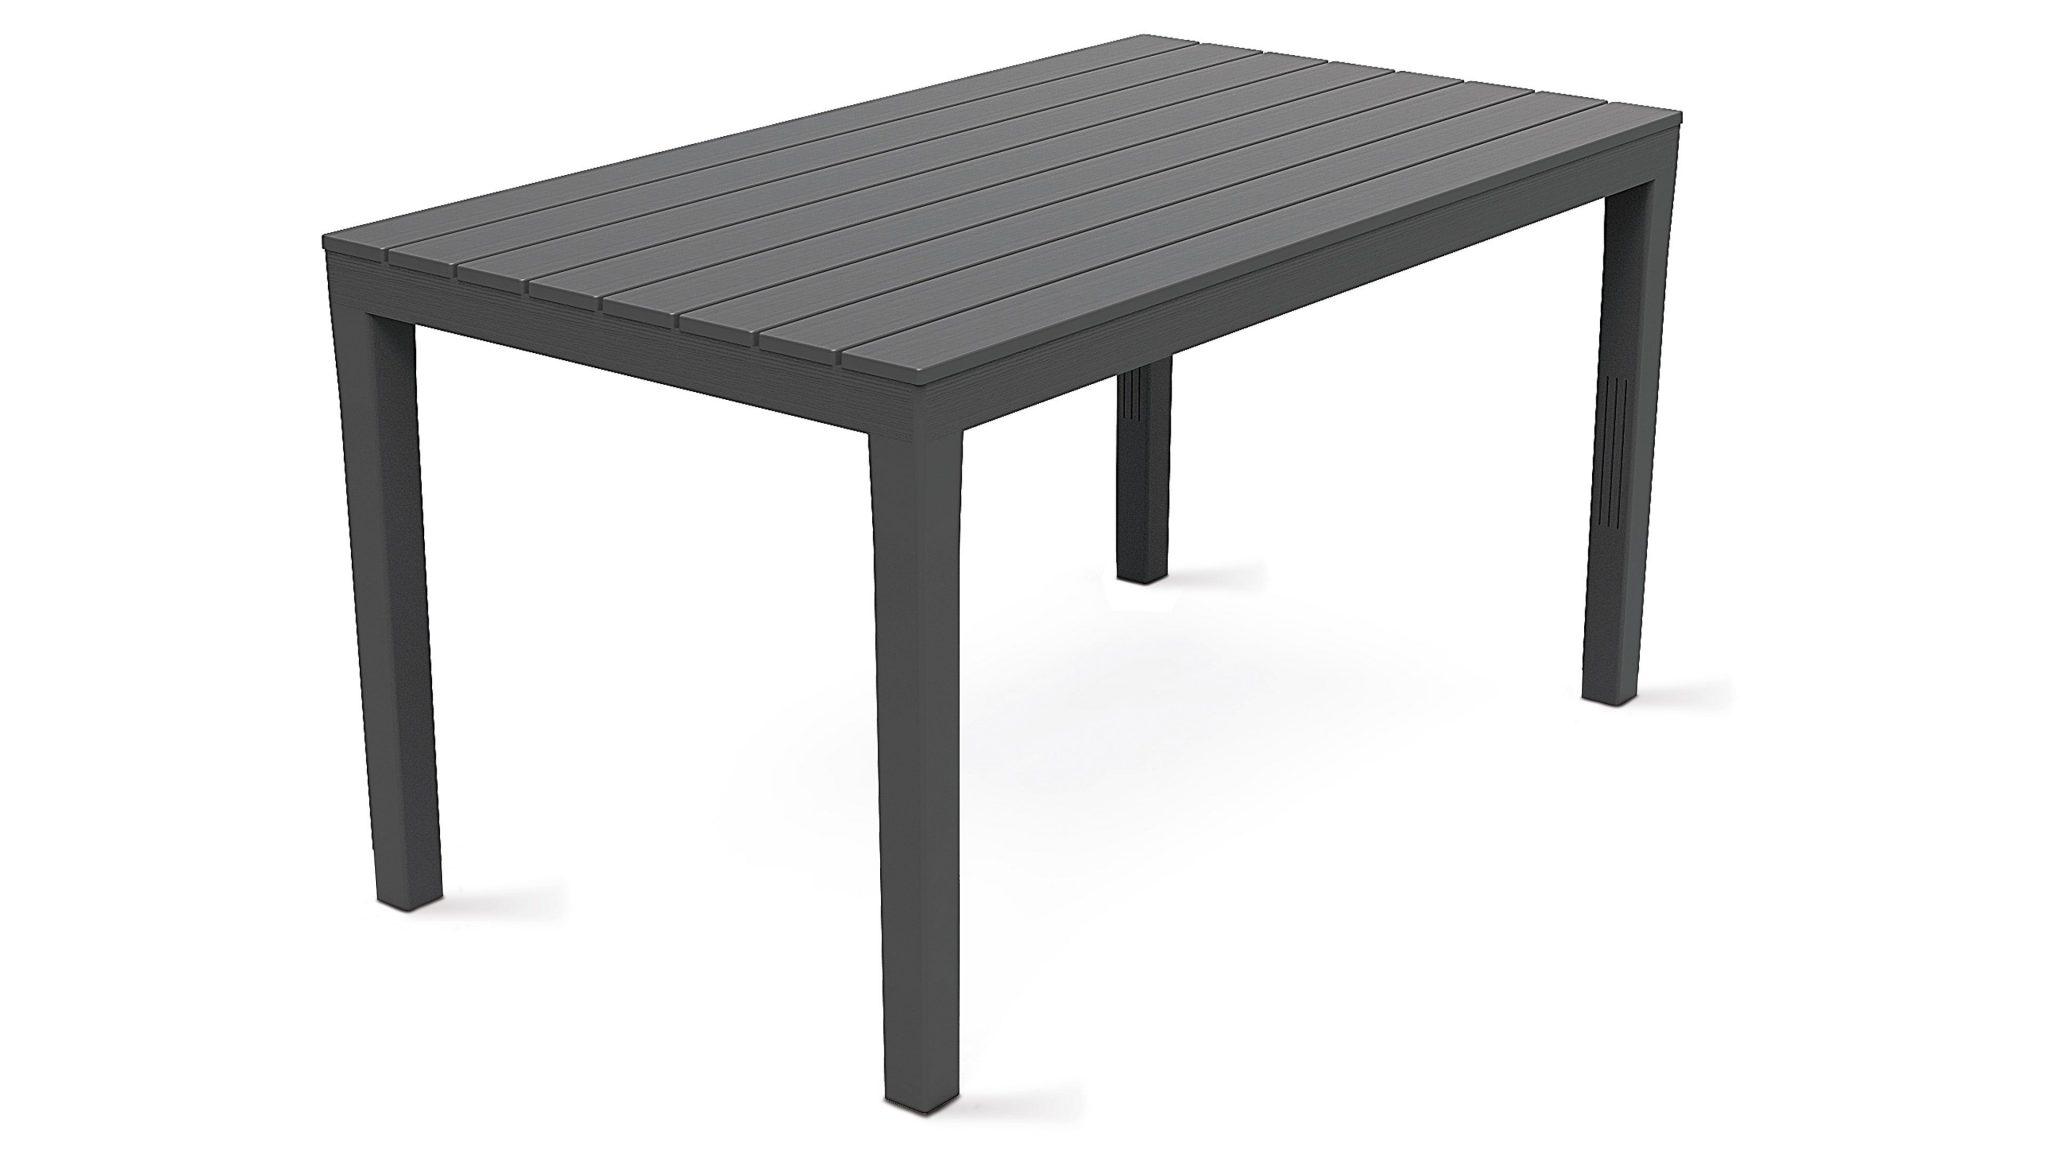 Table De Jardin Ronde En Plastique | Emejing Table De Jardin Pliante ...